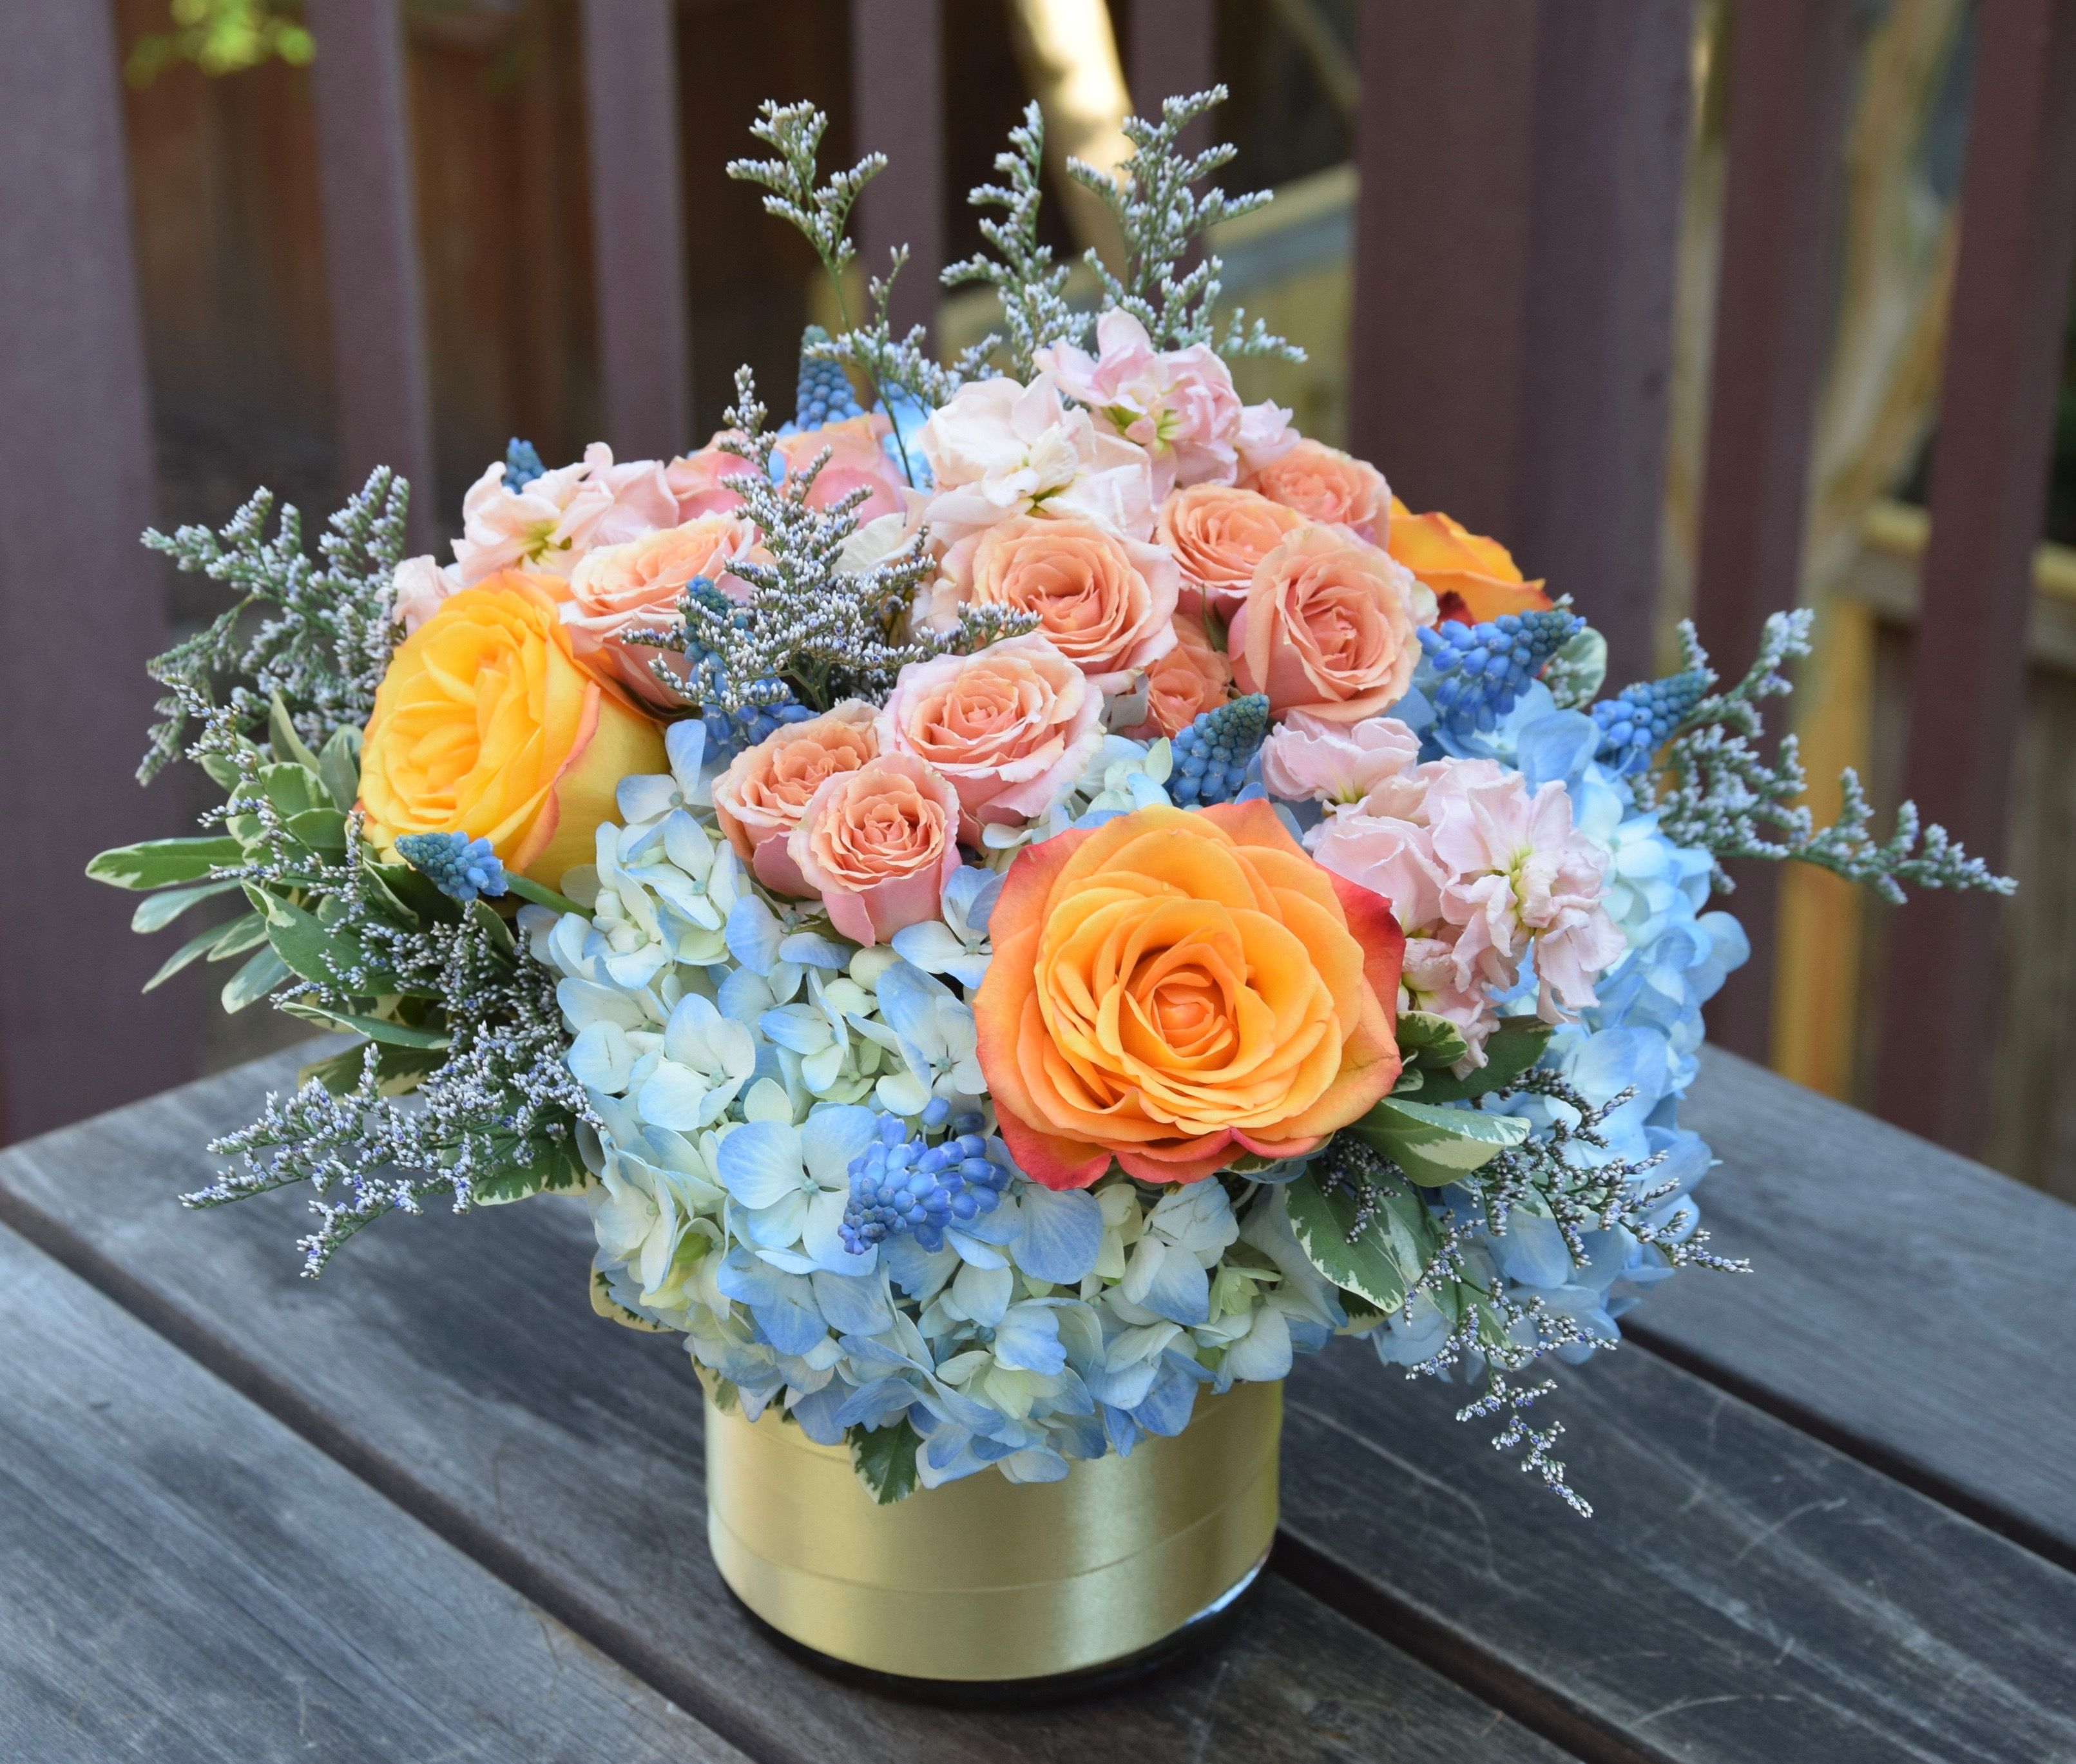 Flower Arrangement For Mothers